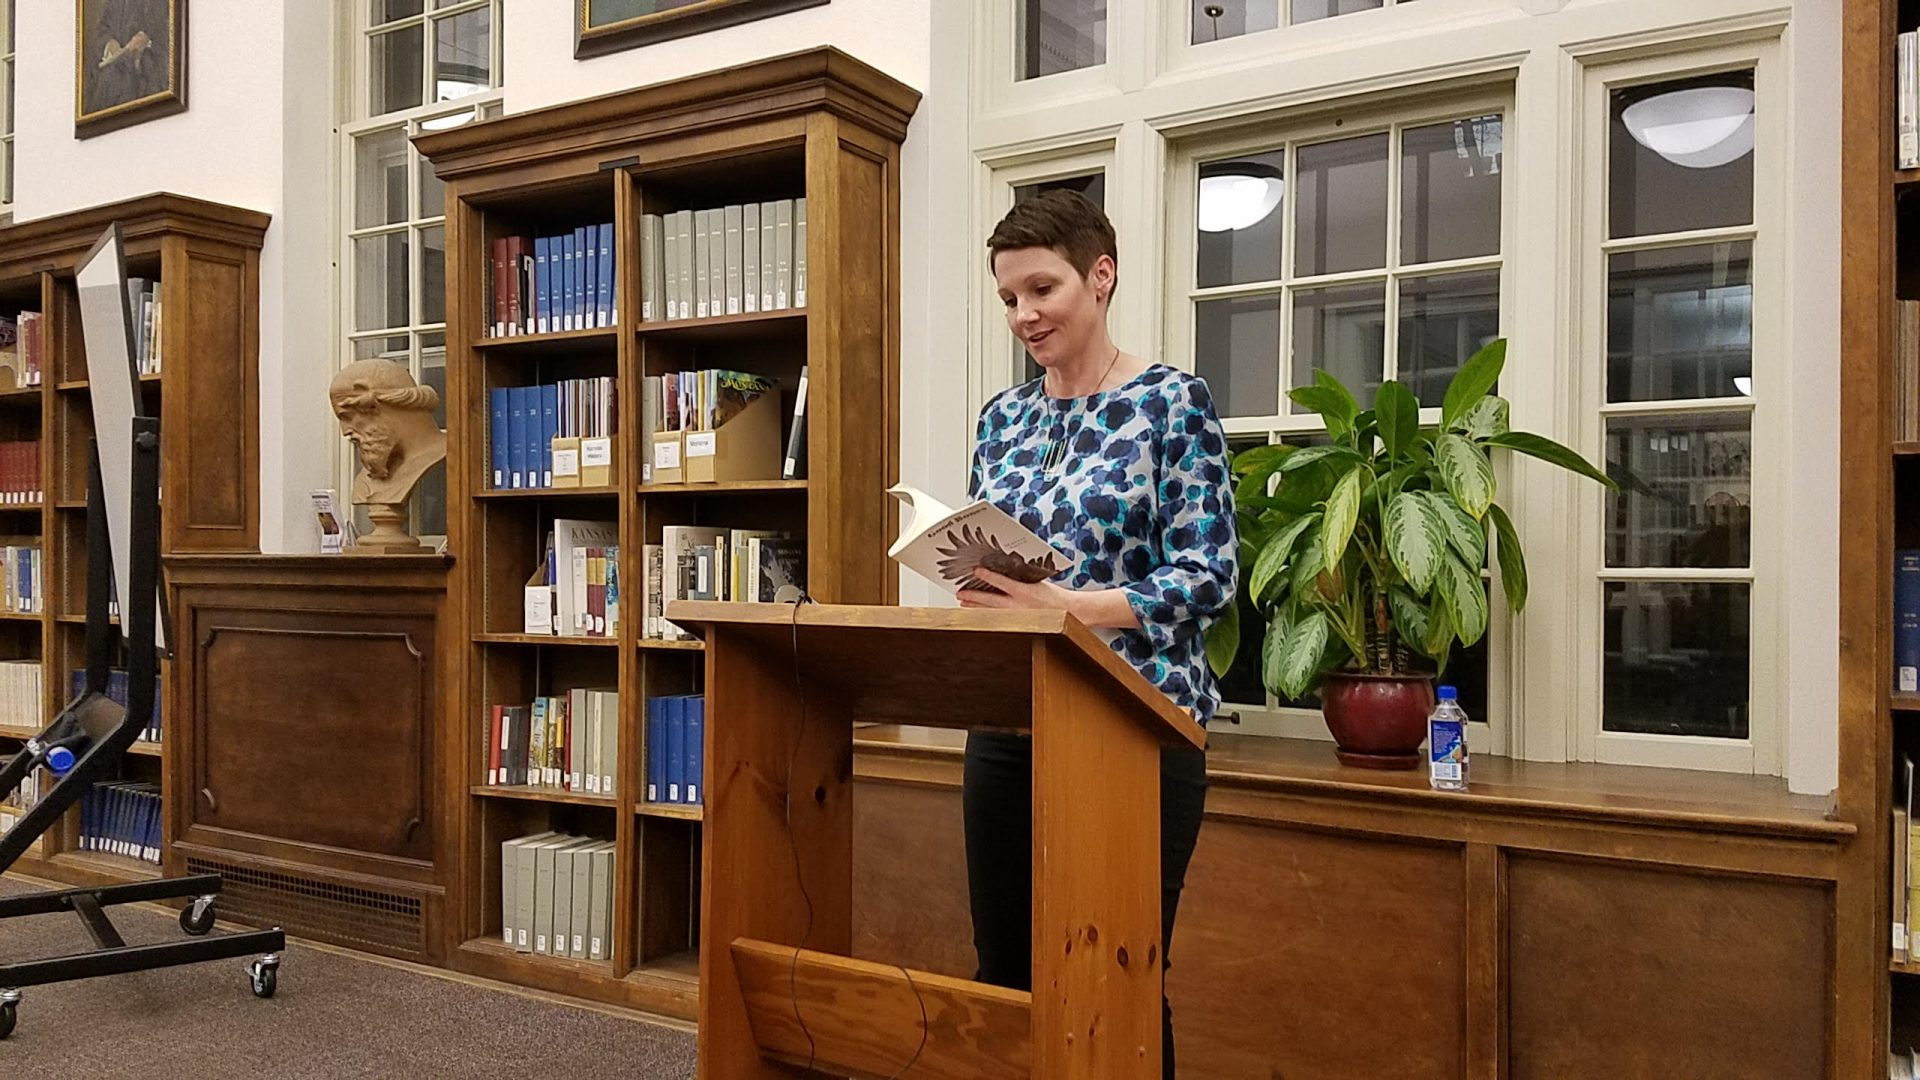 woman behind podium